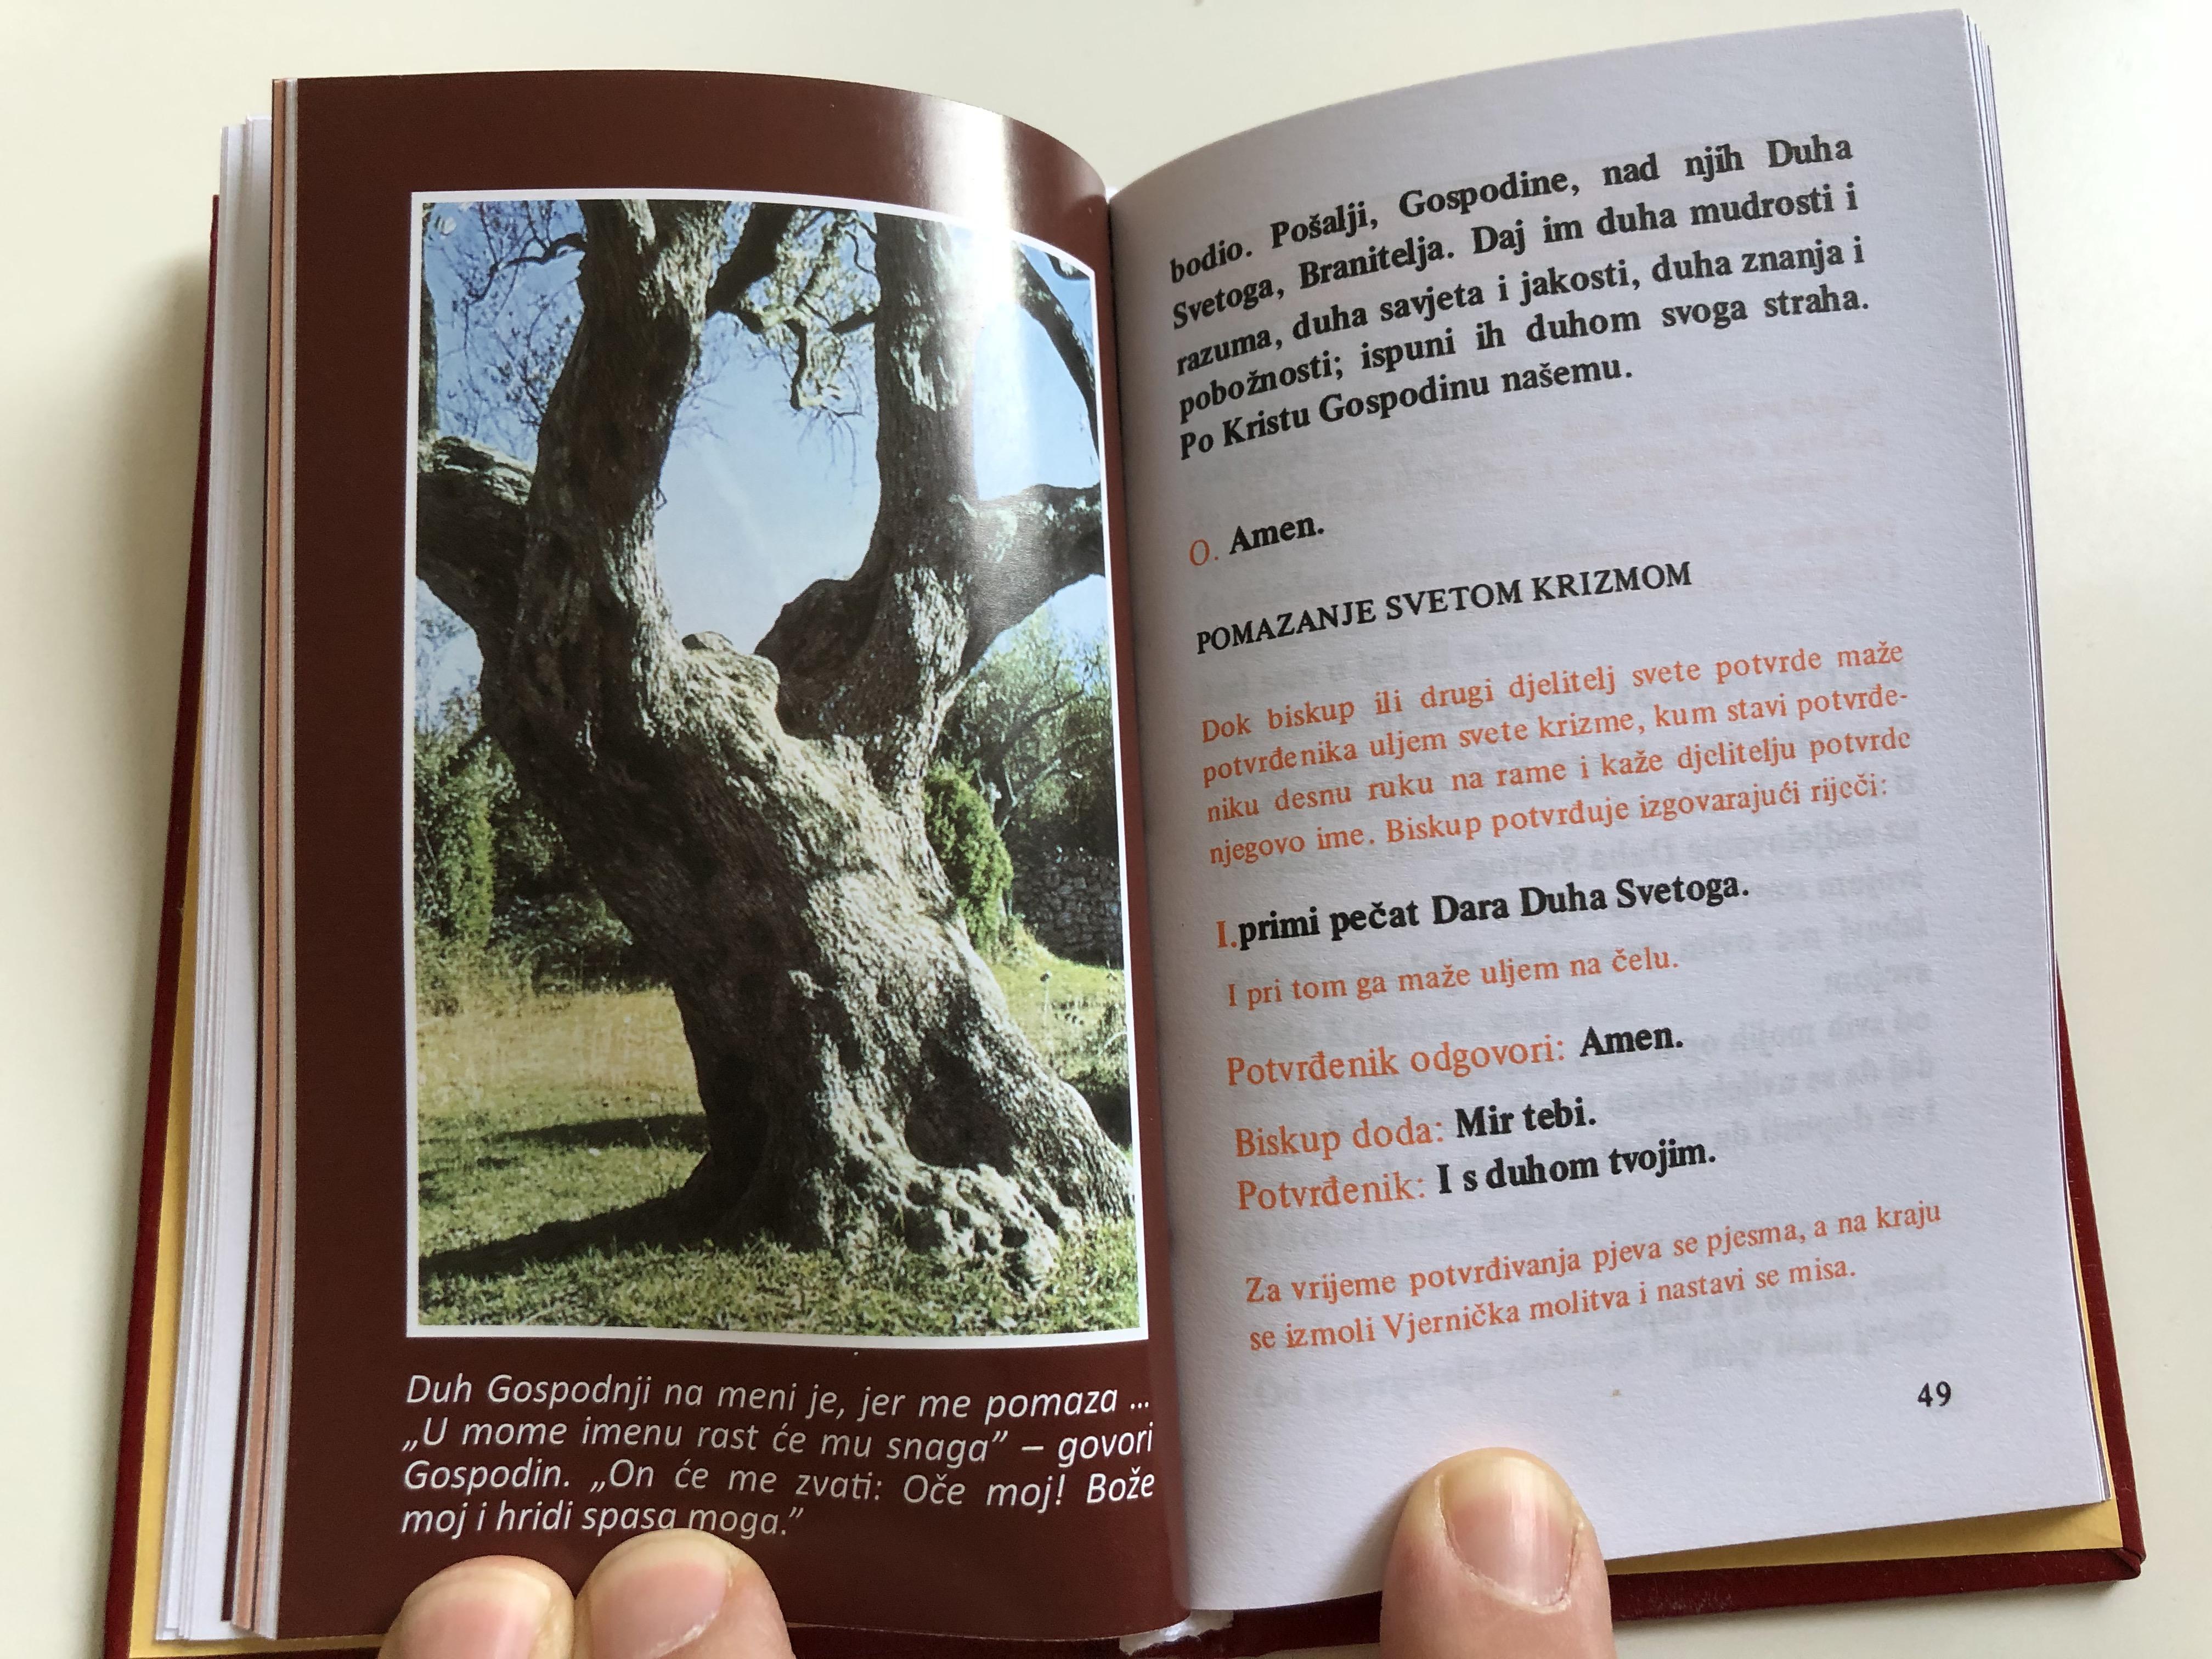 mali-misal-po-kristu-i-s-kristom-croatian-language-catholic-misal-prayer-book-9.jpg